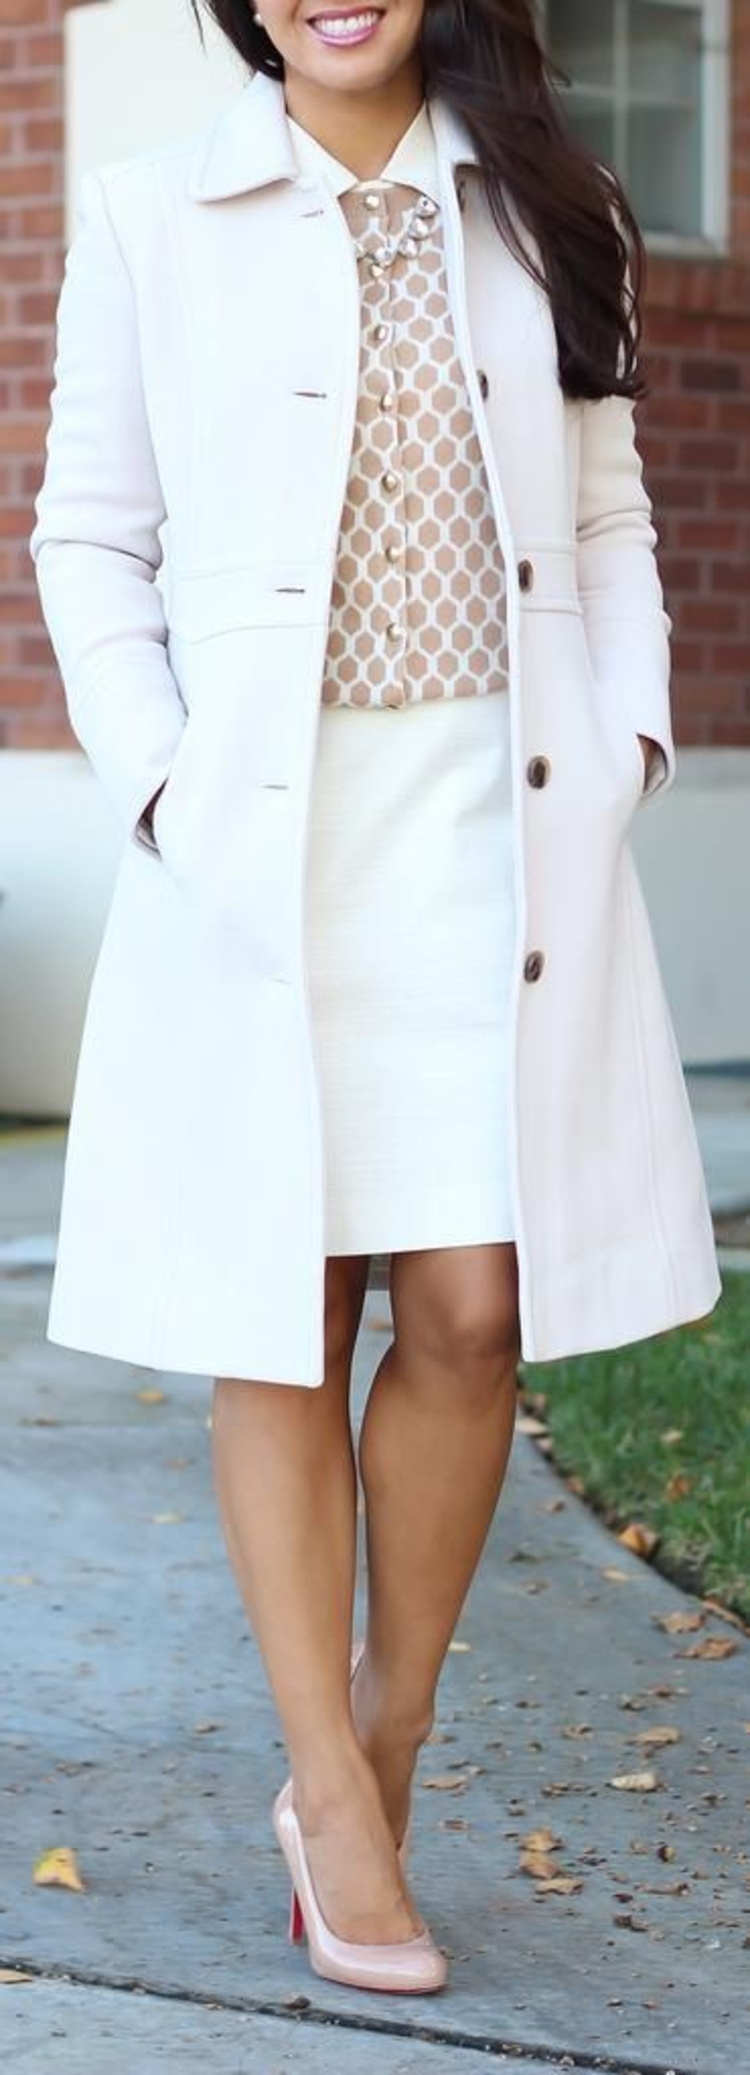 moderne Damenmantel aktuelle Trendfarben Weiß Damenmantel